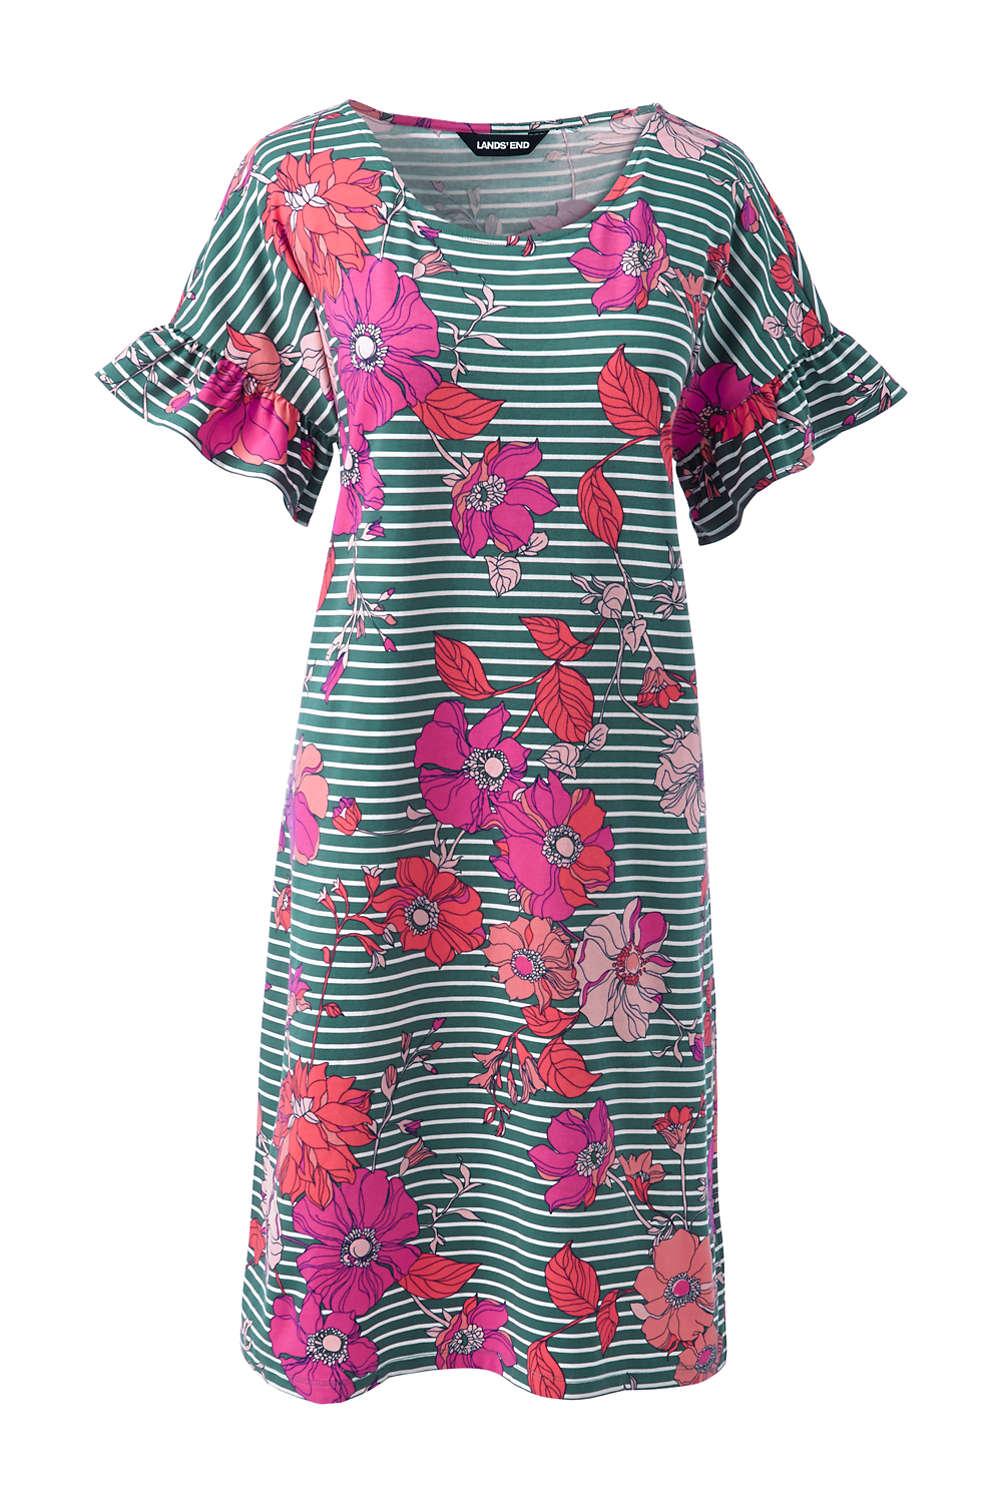 00256b3bf67 Women s Plus Size Short Sleeve Ruffle Knit Print Tee Shirt Dress ...